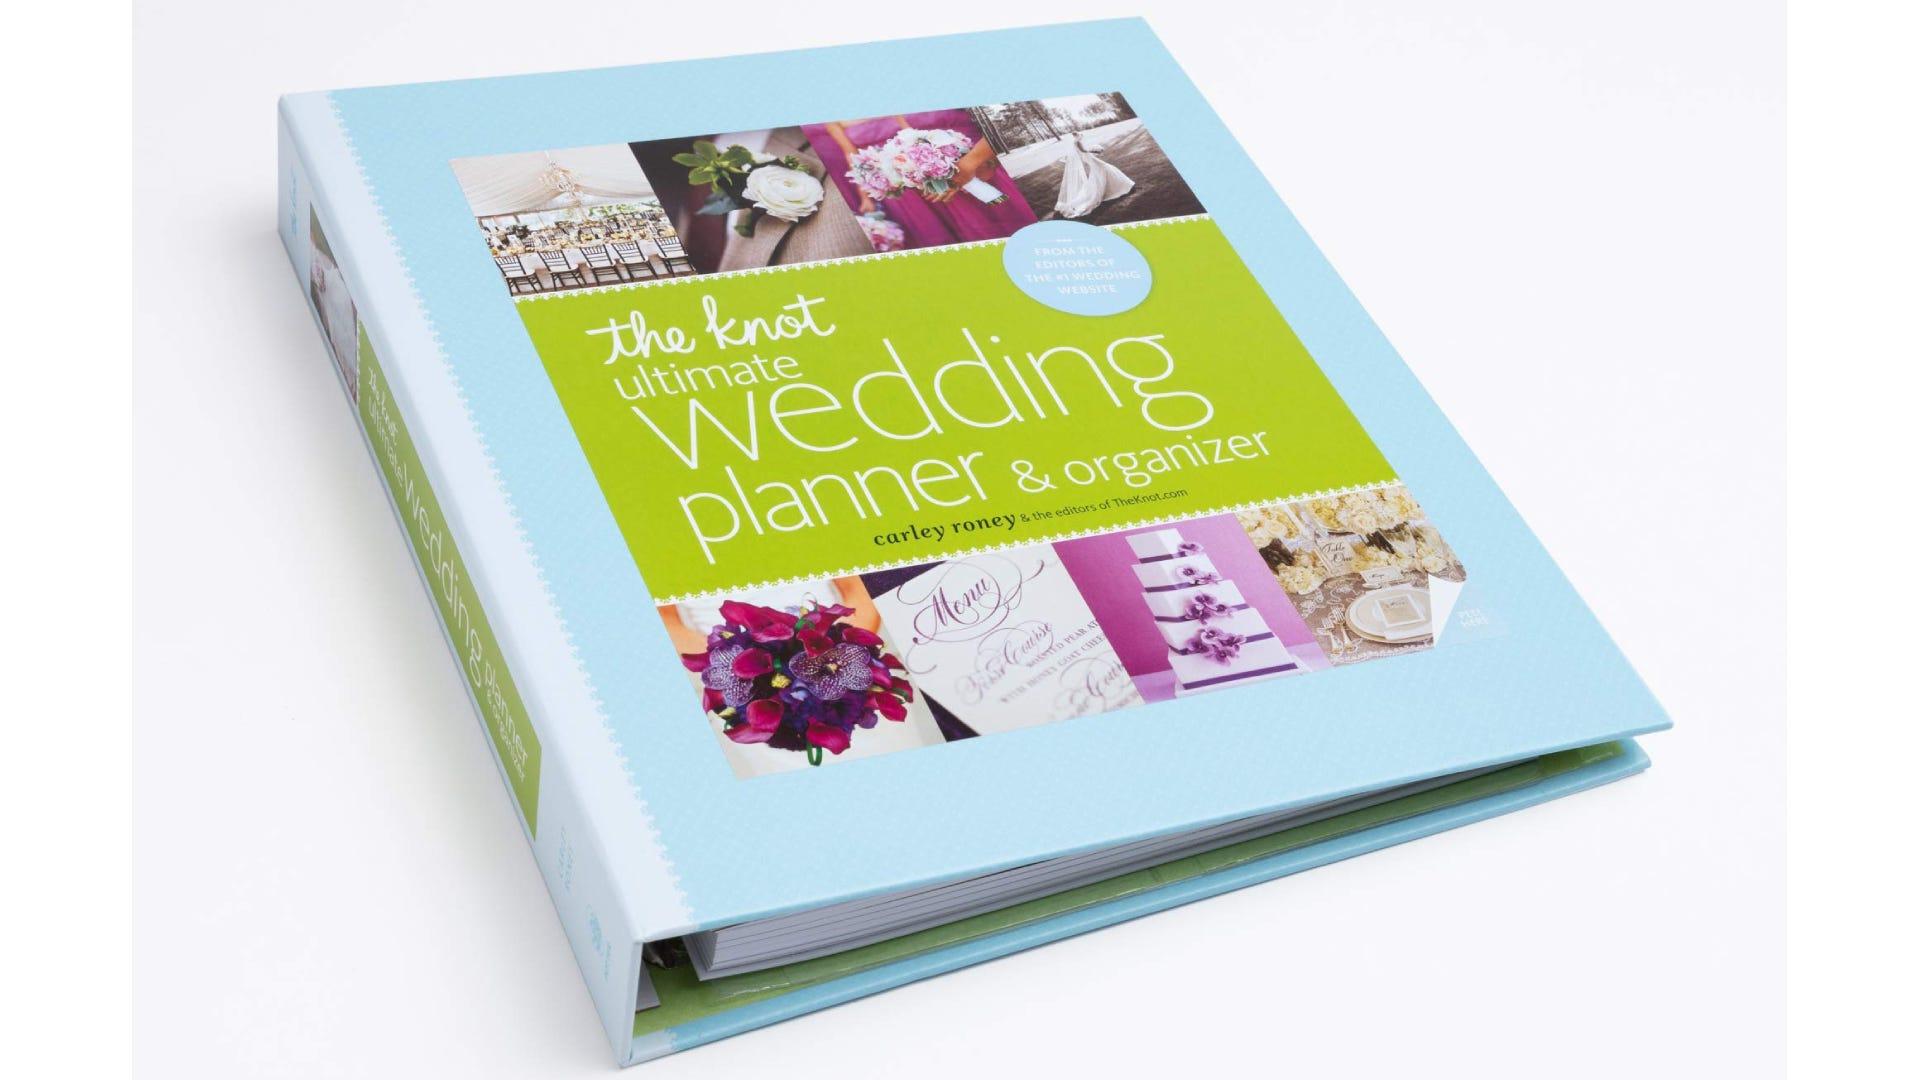 A blue and green binder wedding planner book.